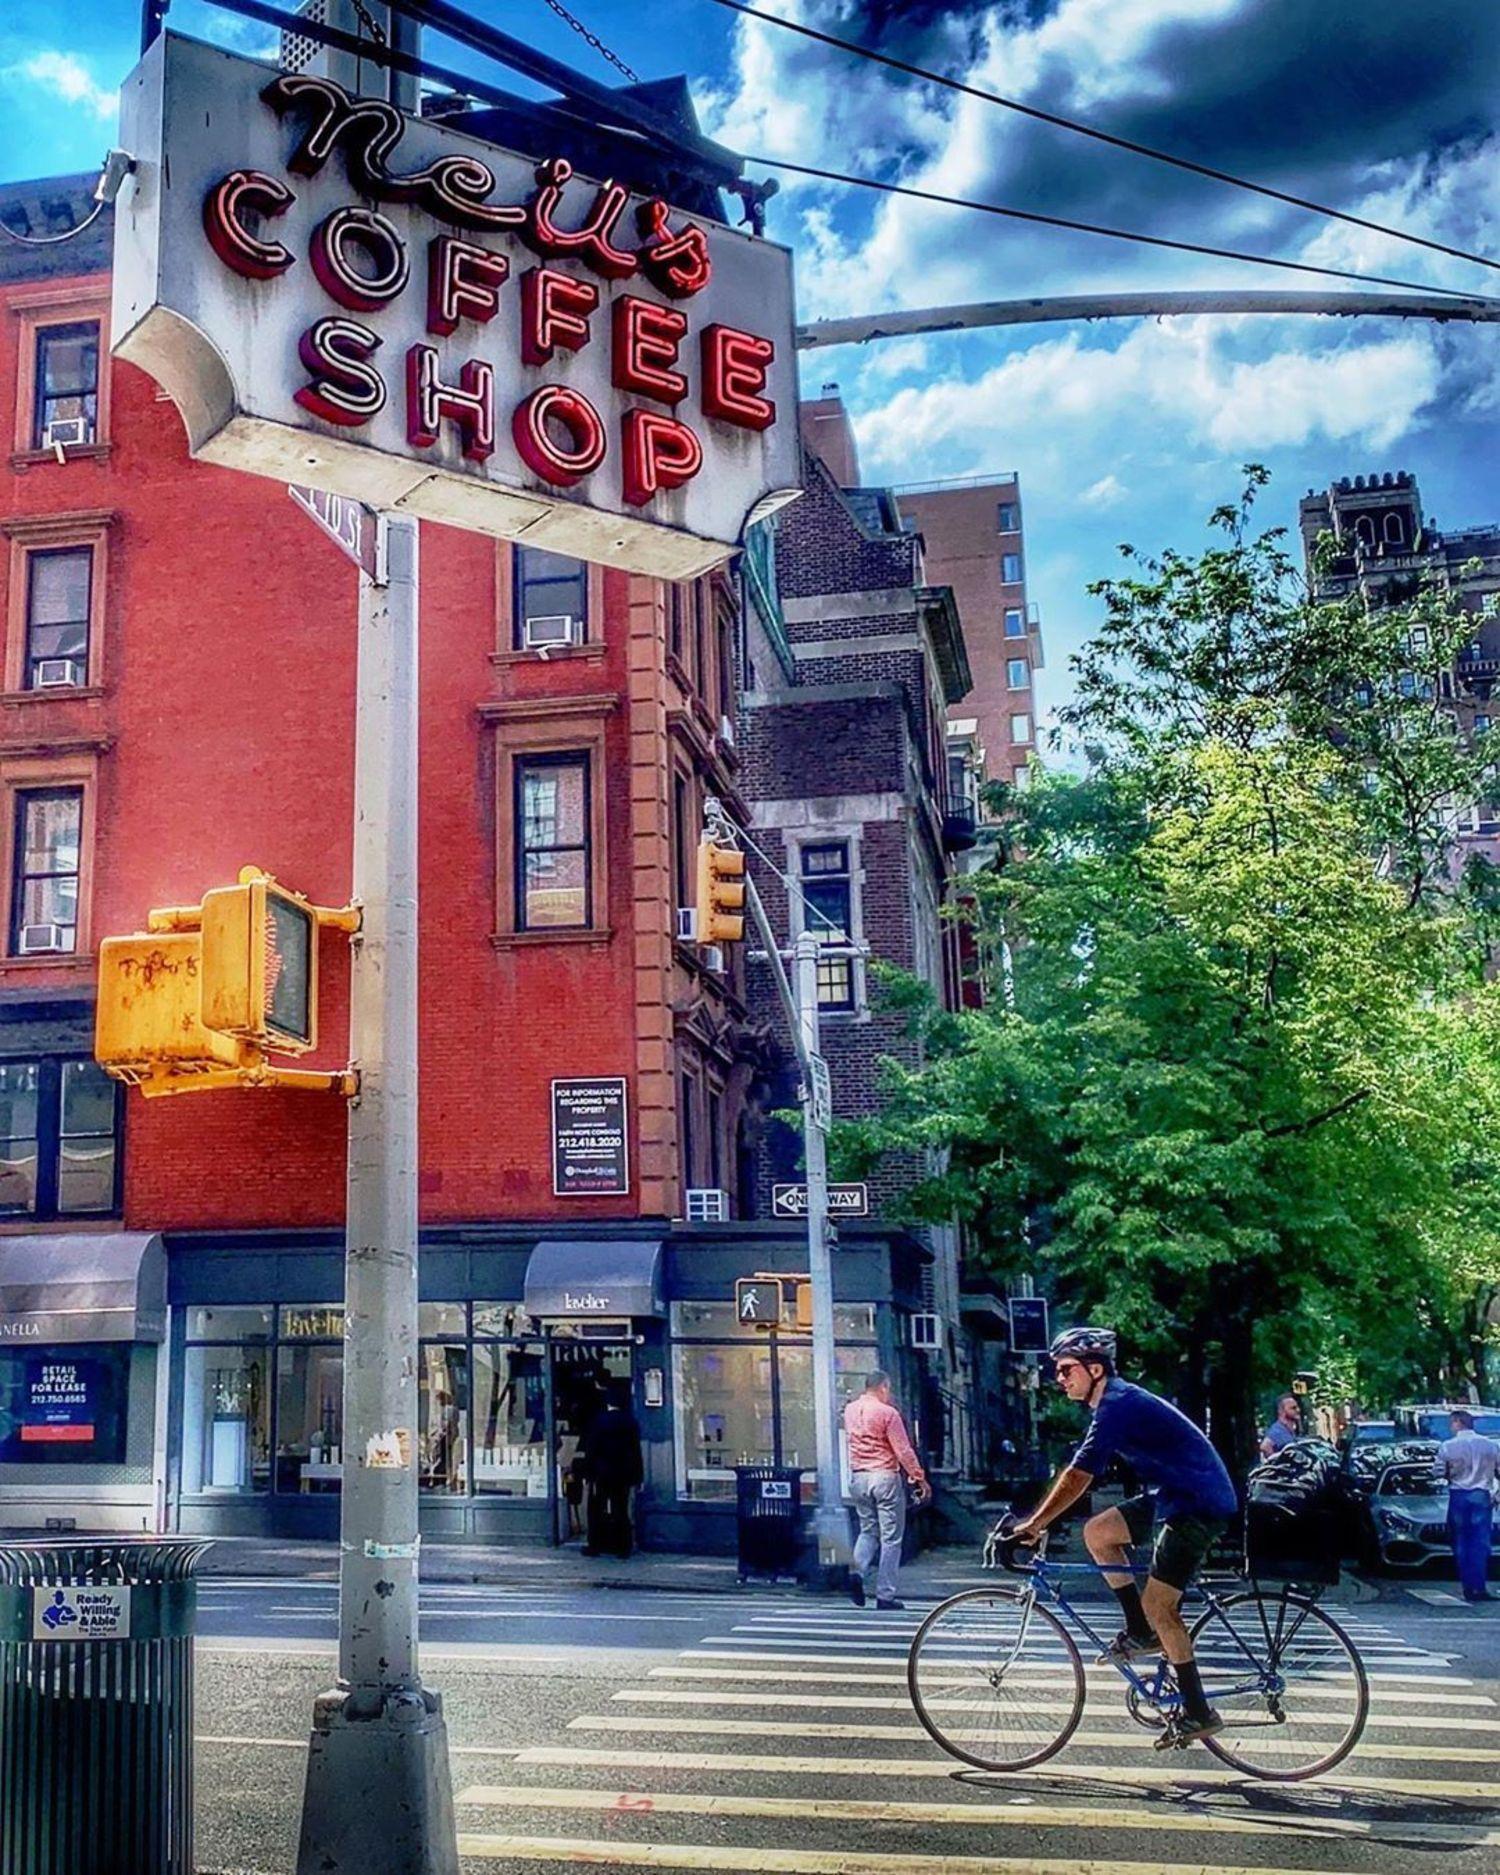 Neil's Coffee Shop, Upper East Side, Manhattan